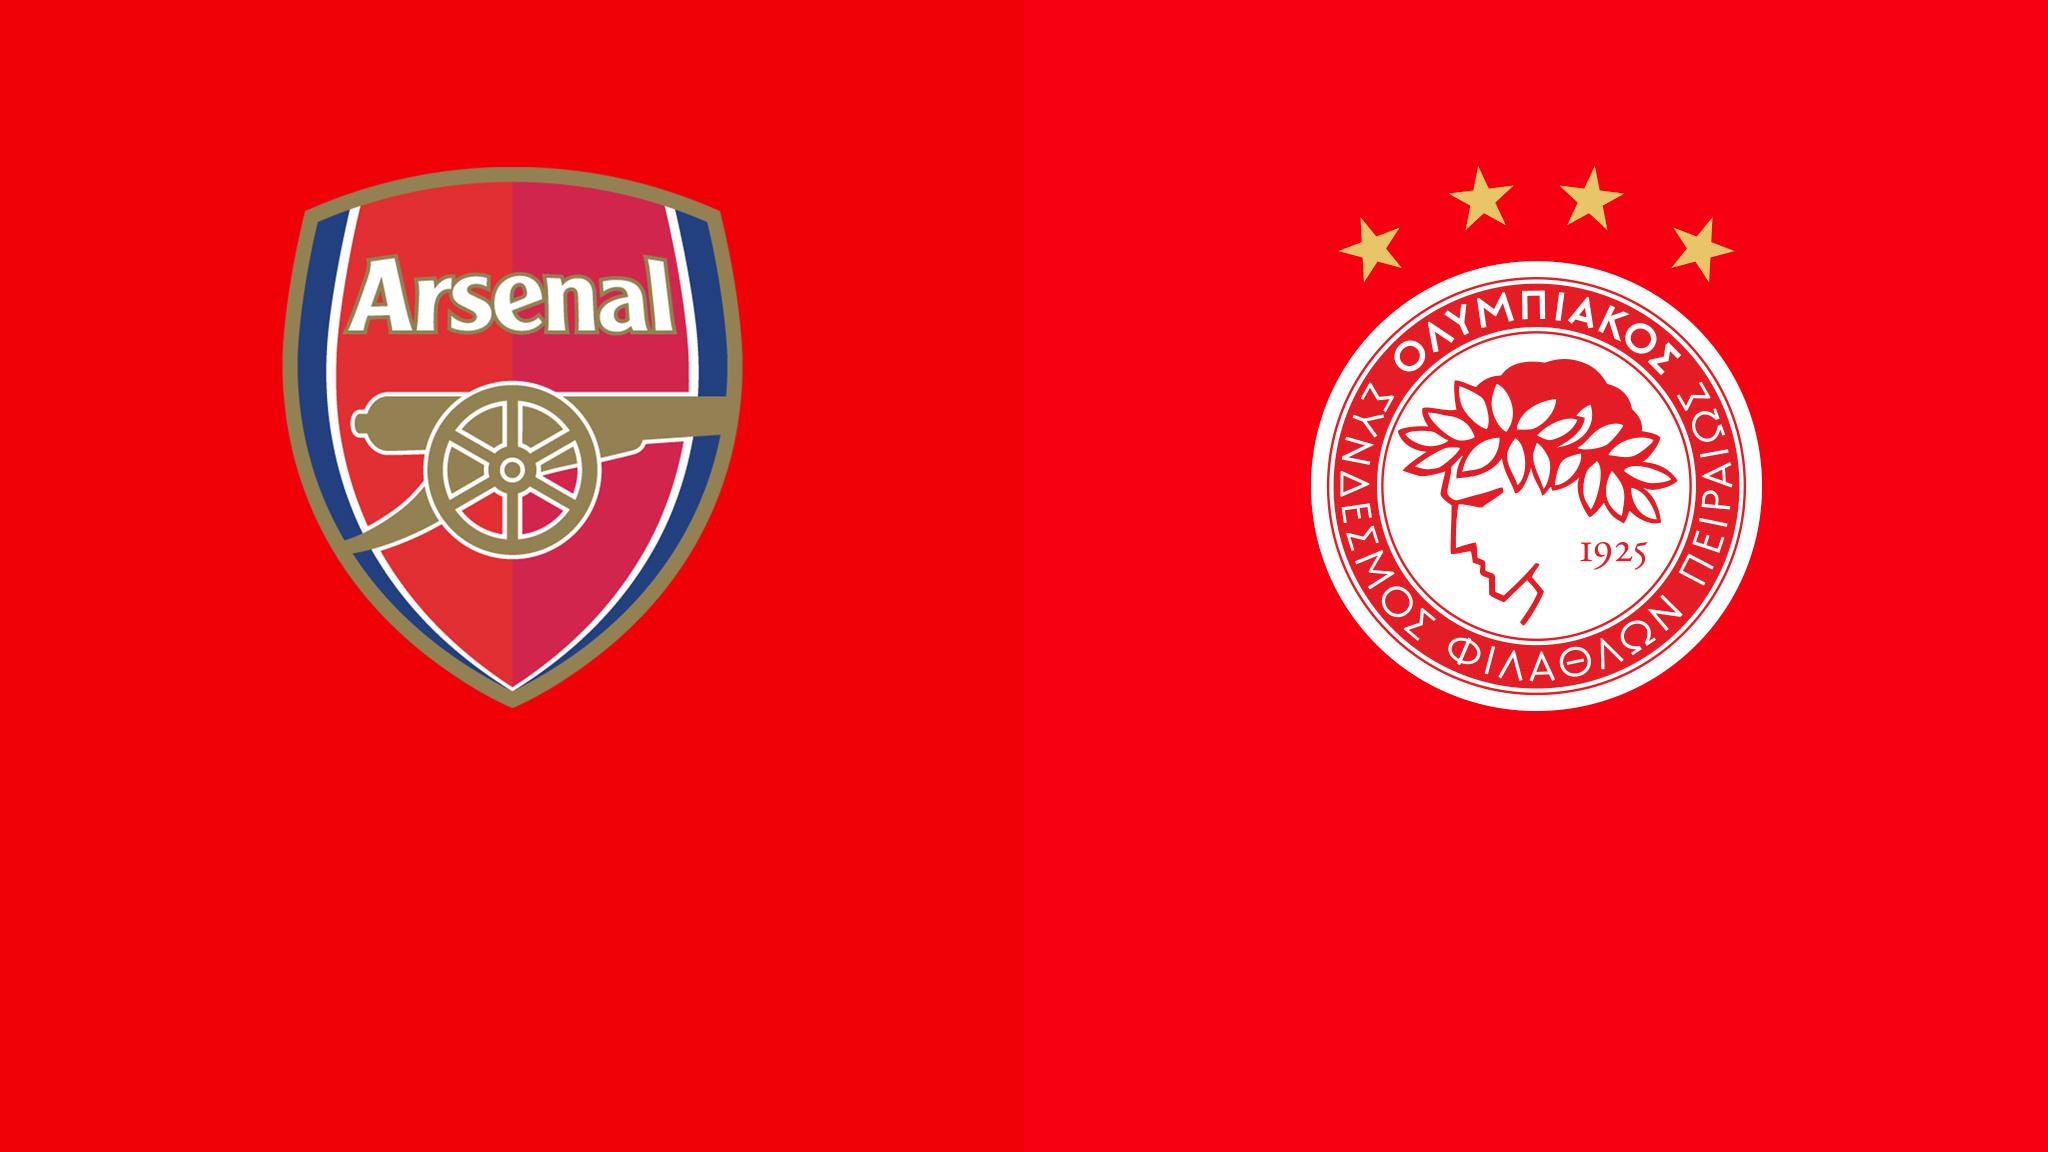 Arsenal vs Olympiacos Europa League